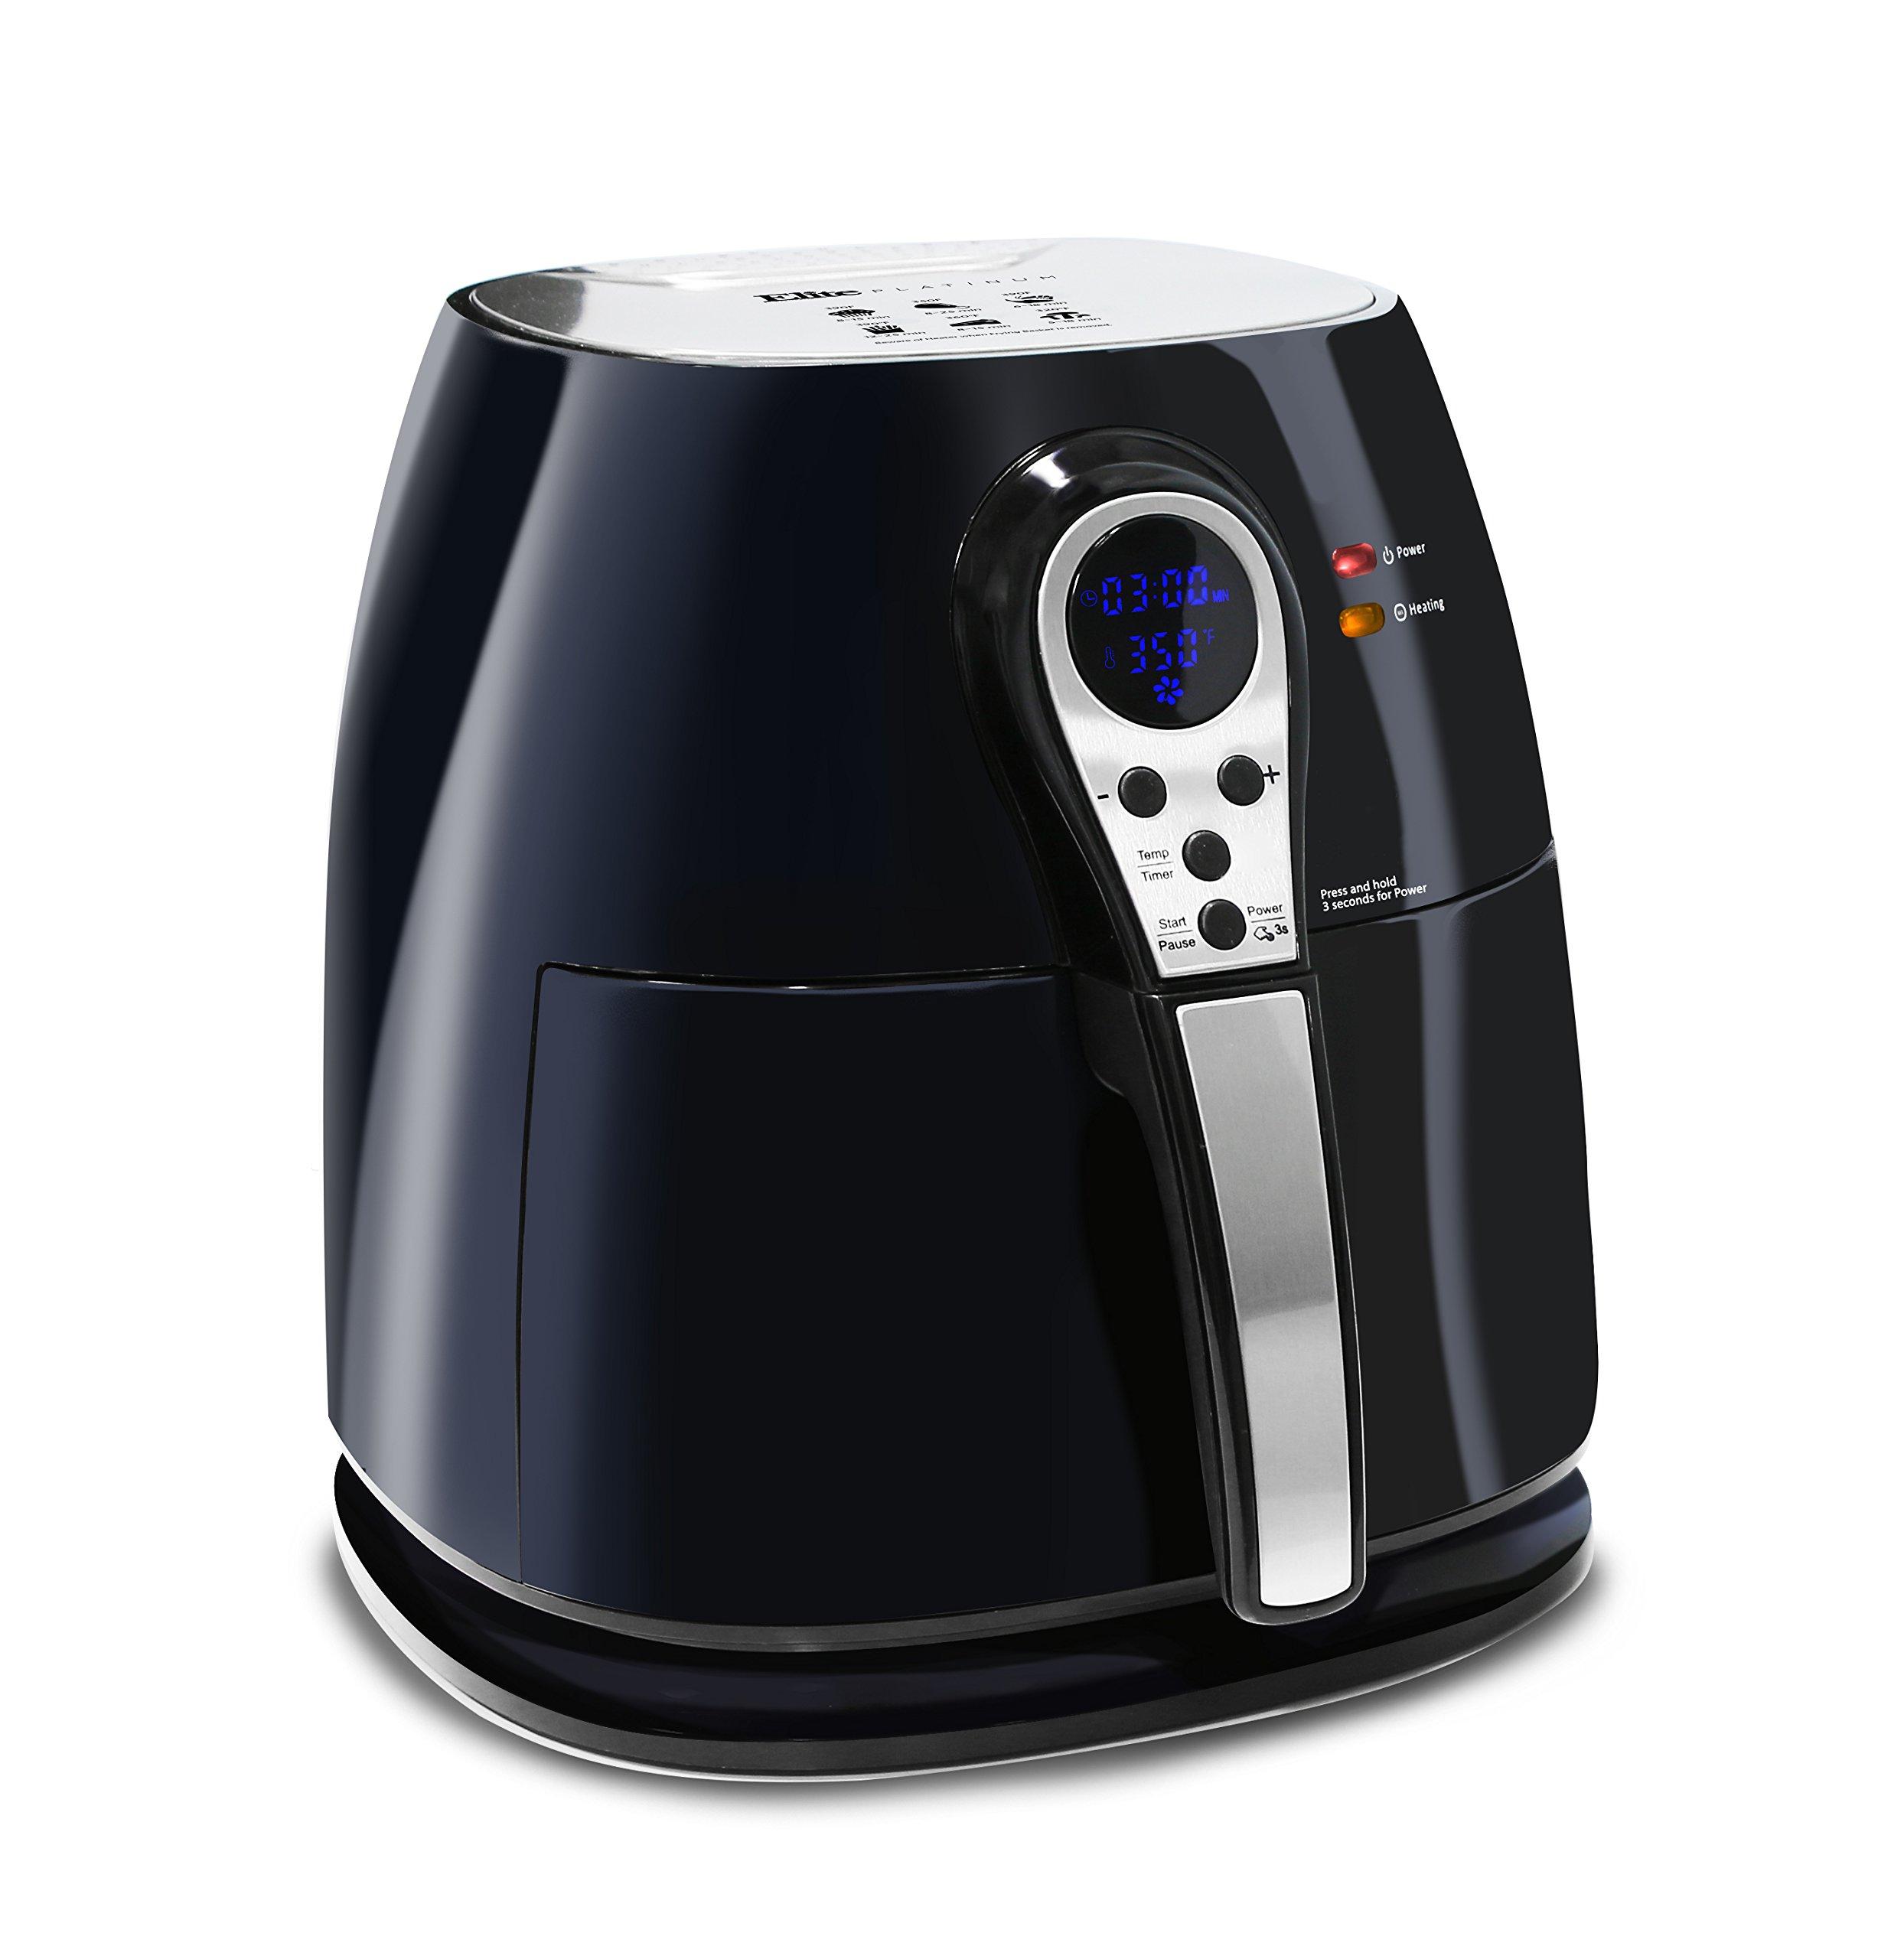 Elite Platinum 3.2 Quart Electric Digital Air Fryer Cooker, 1400-Watts with 26 Full Color Recipes (Black)